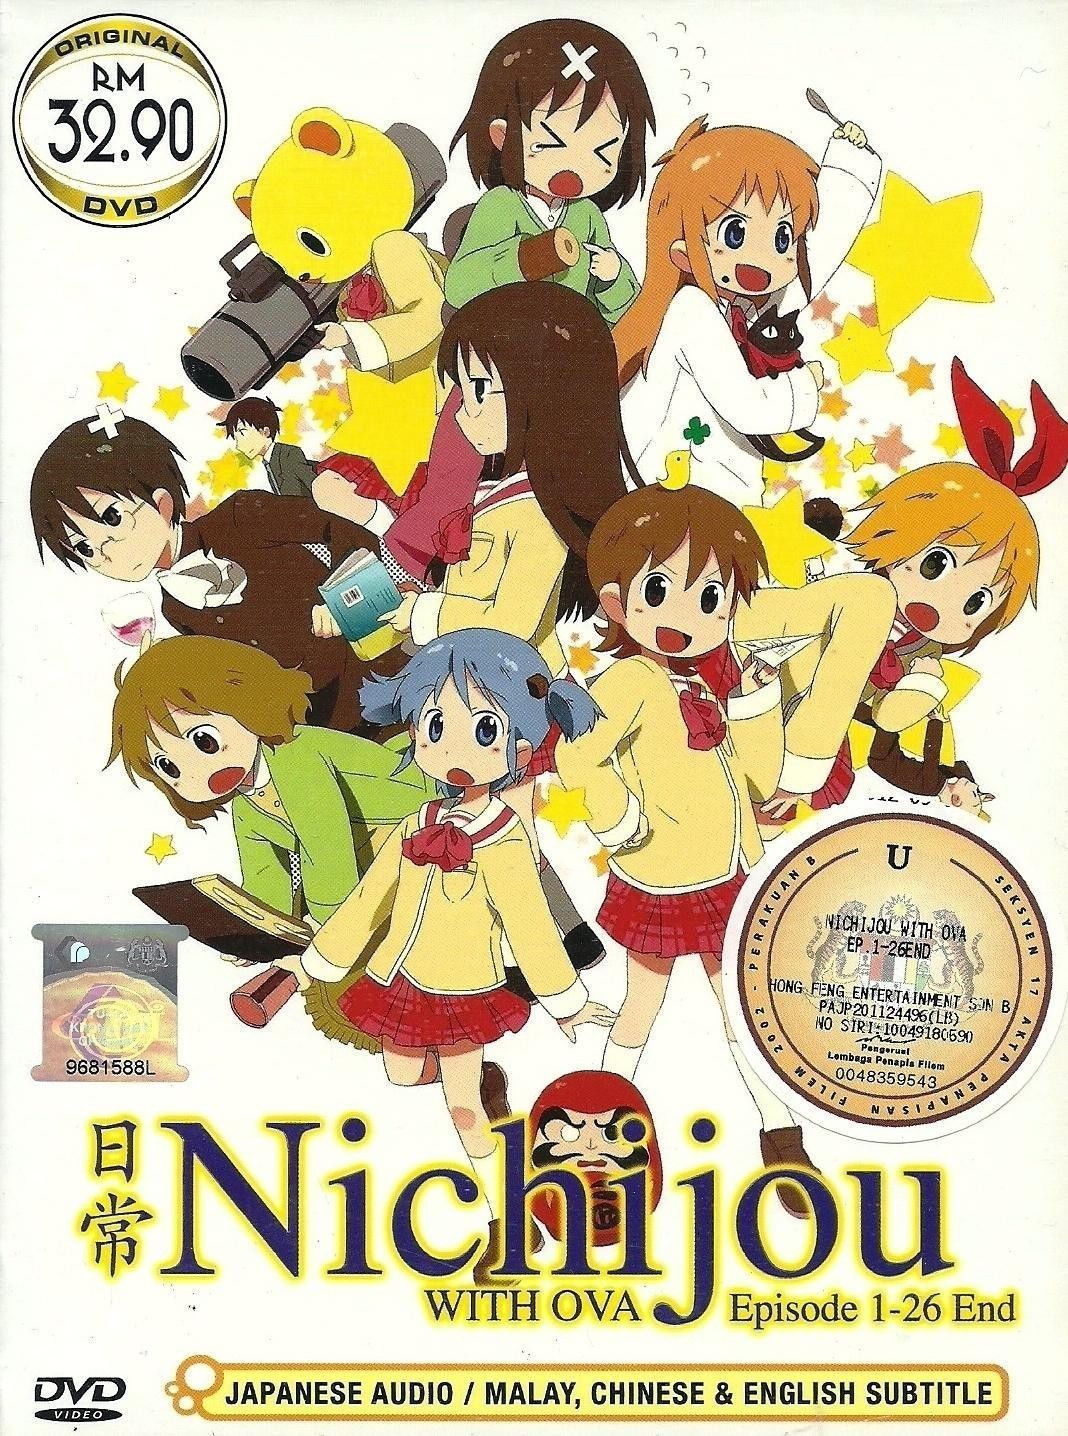 DVD JAPANESE ANIME NICHIJOU Vol 1-26End + OVA My Ordinary Life